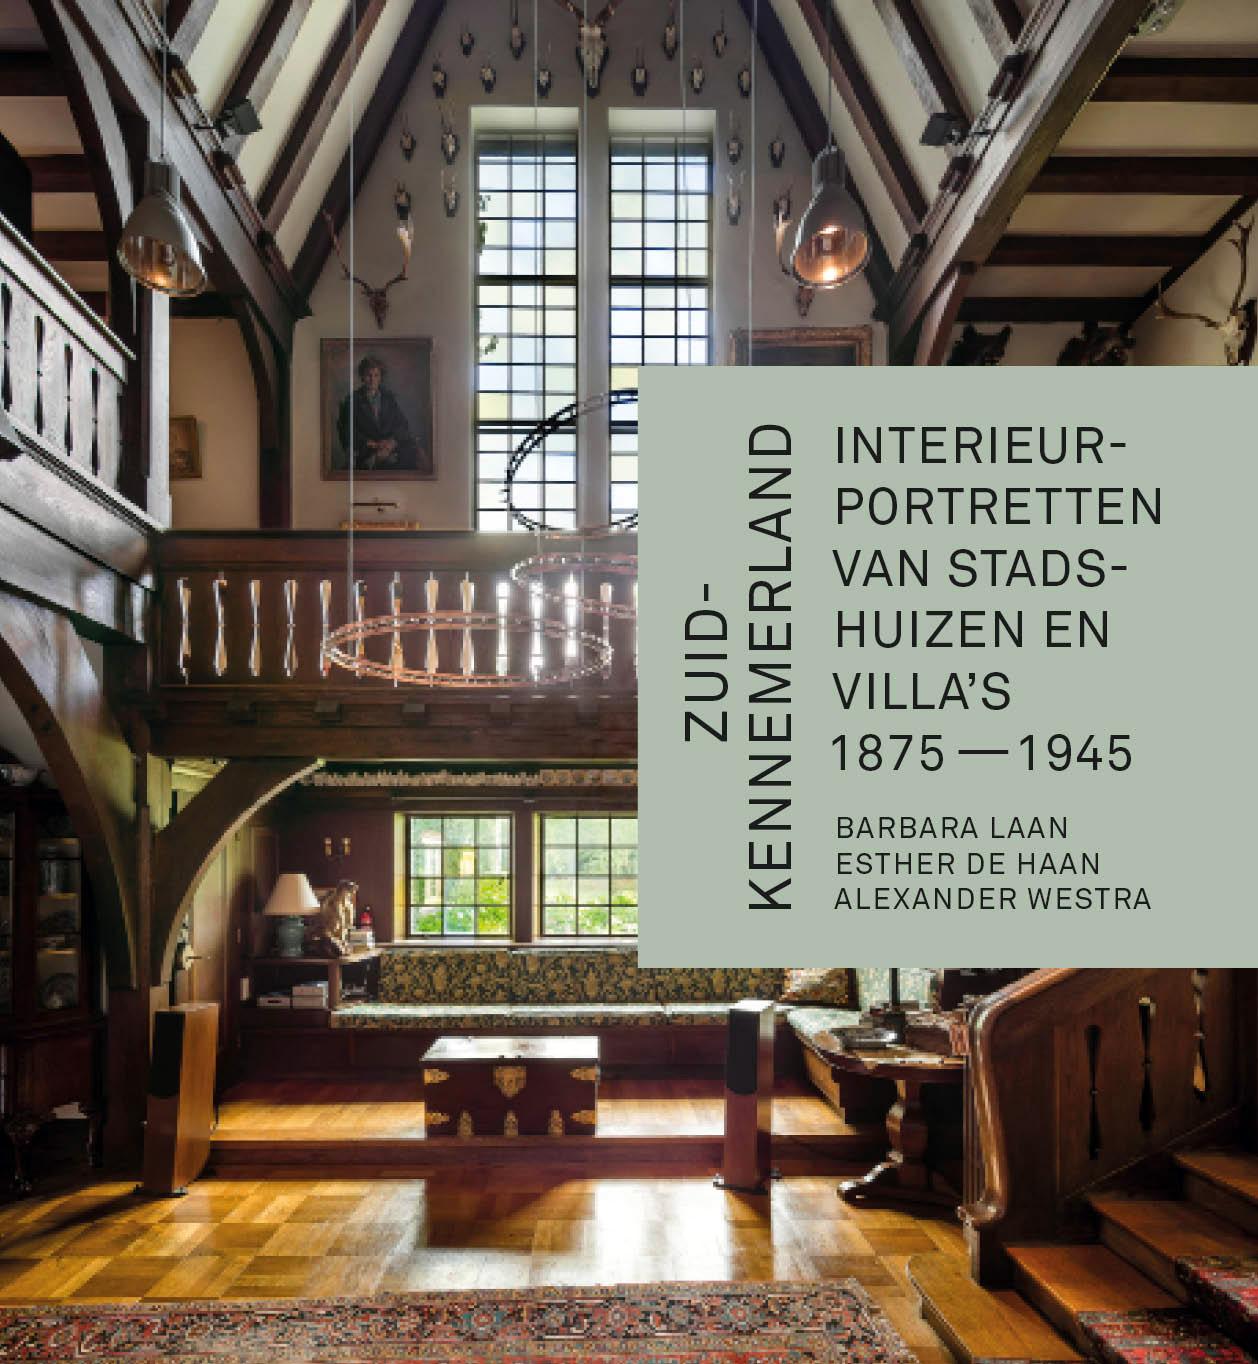 Publicaties | Stichting Historische Interieurs Amsterdam